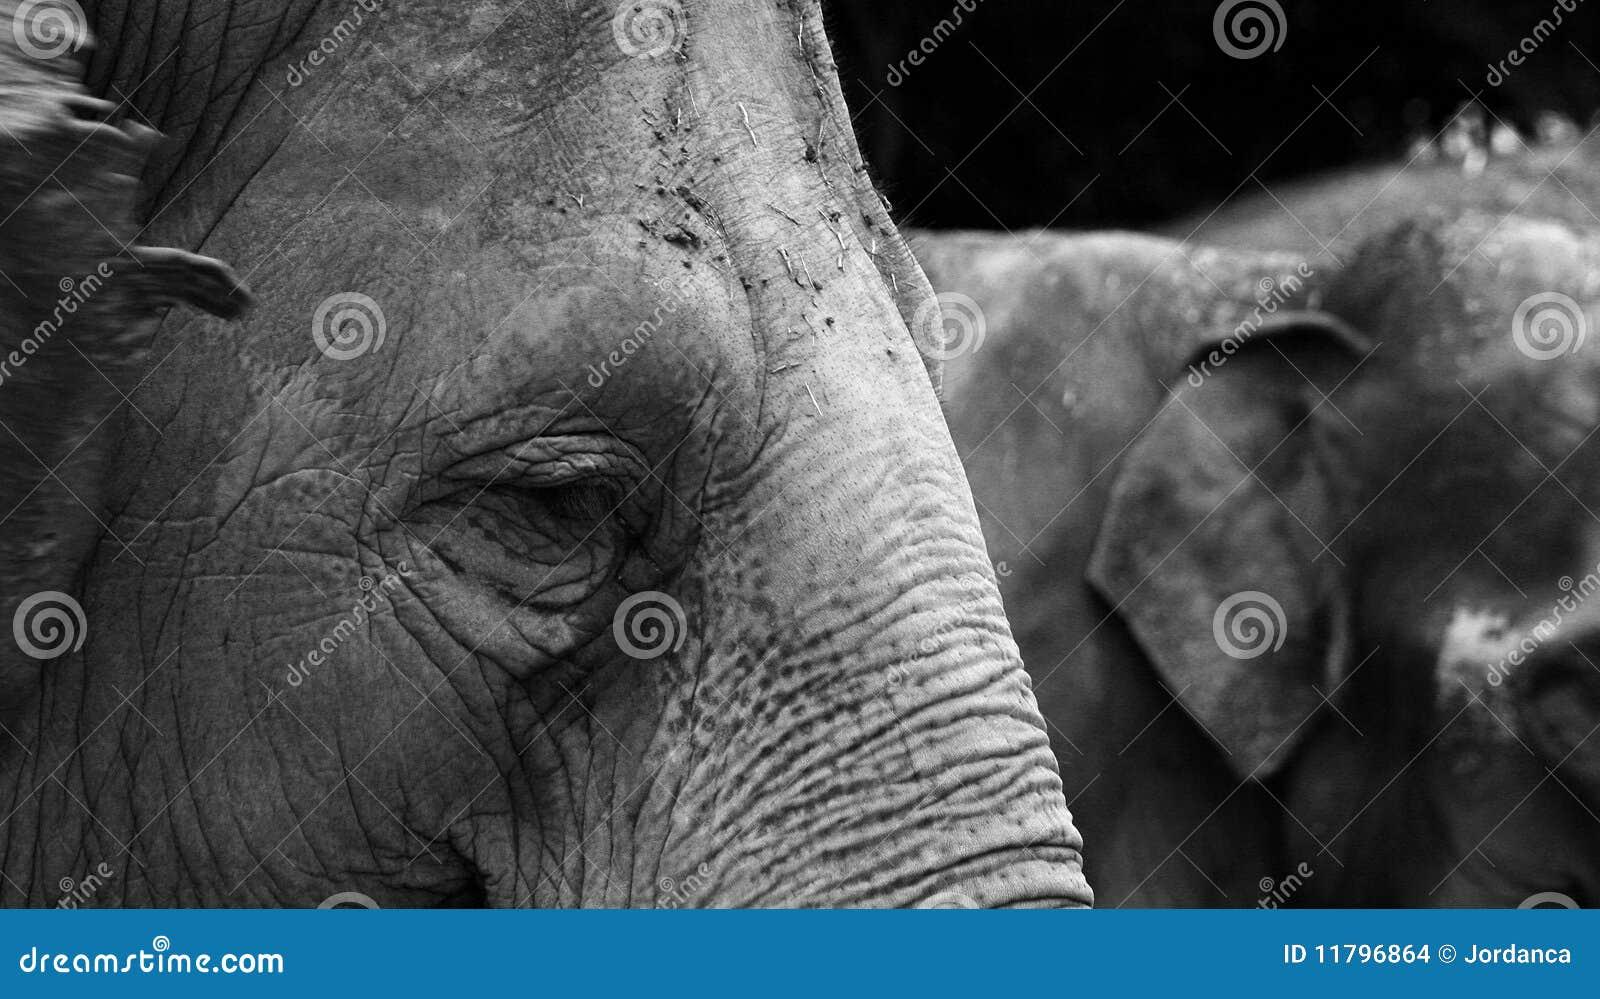 Elefant in Schwarzweiss